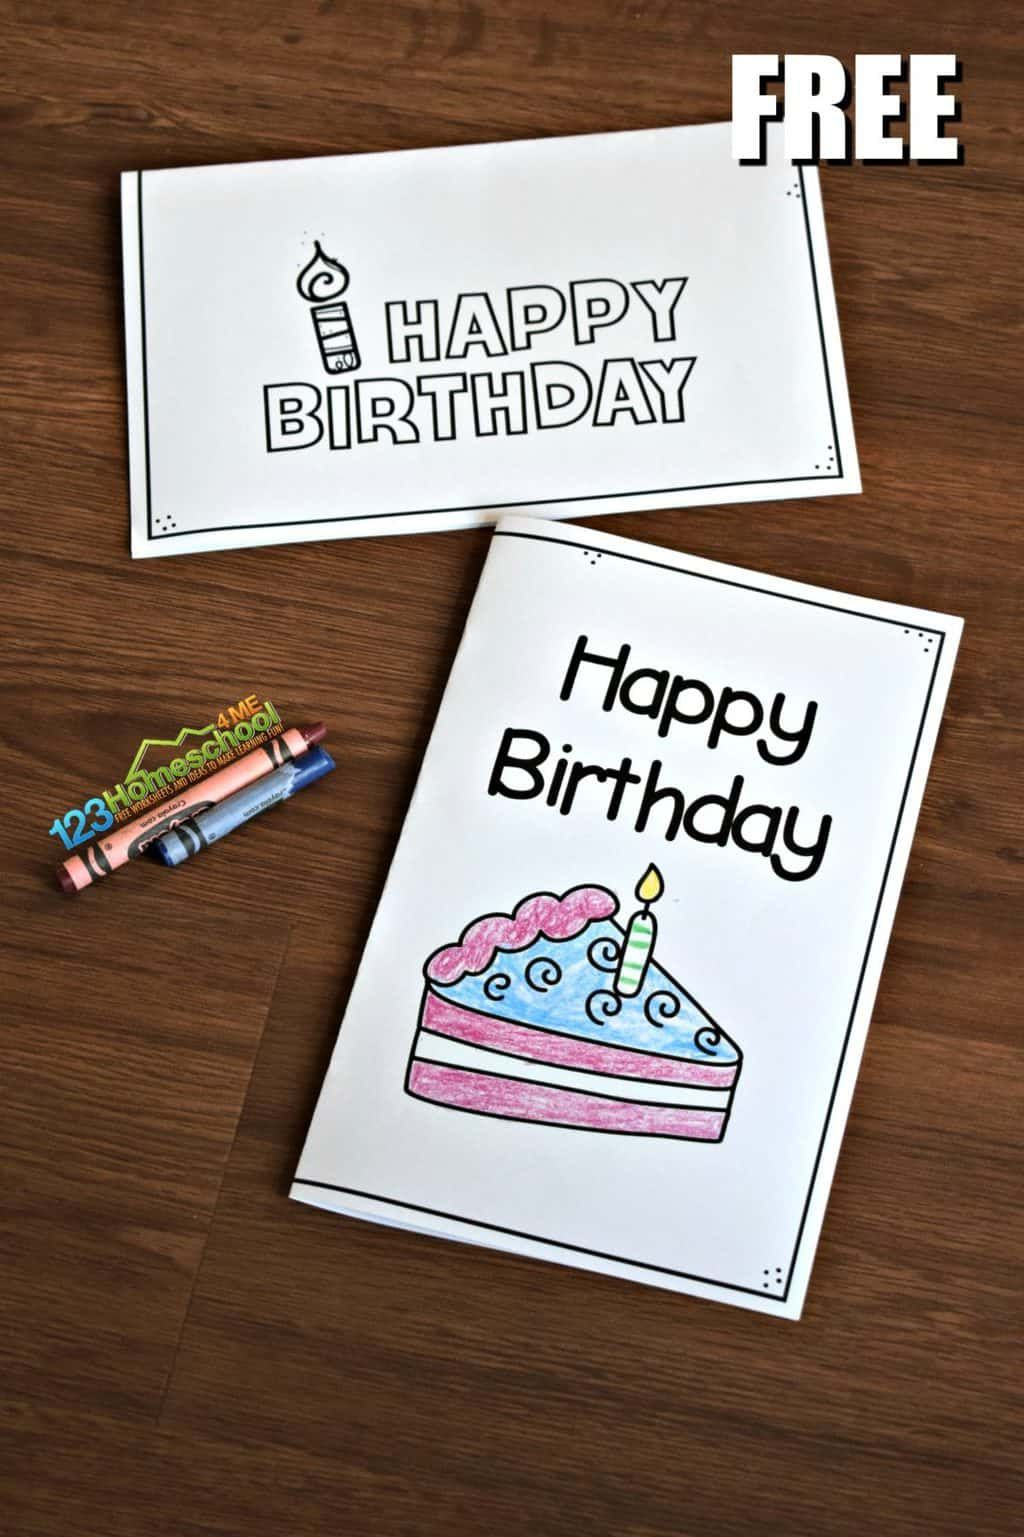 Free Printable Birthday Cards Free Printable Birthday Cards Free Birthday Card Birthday Cards To Print